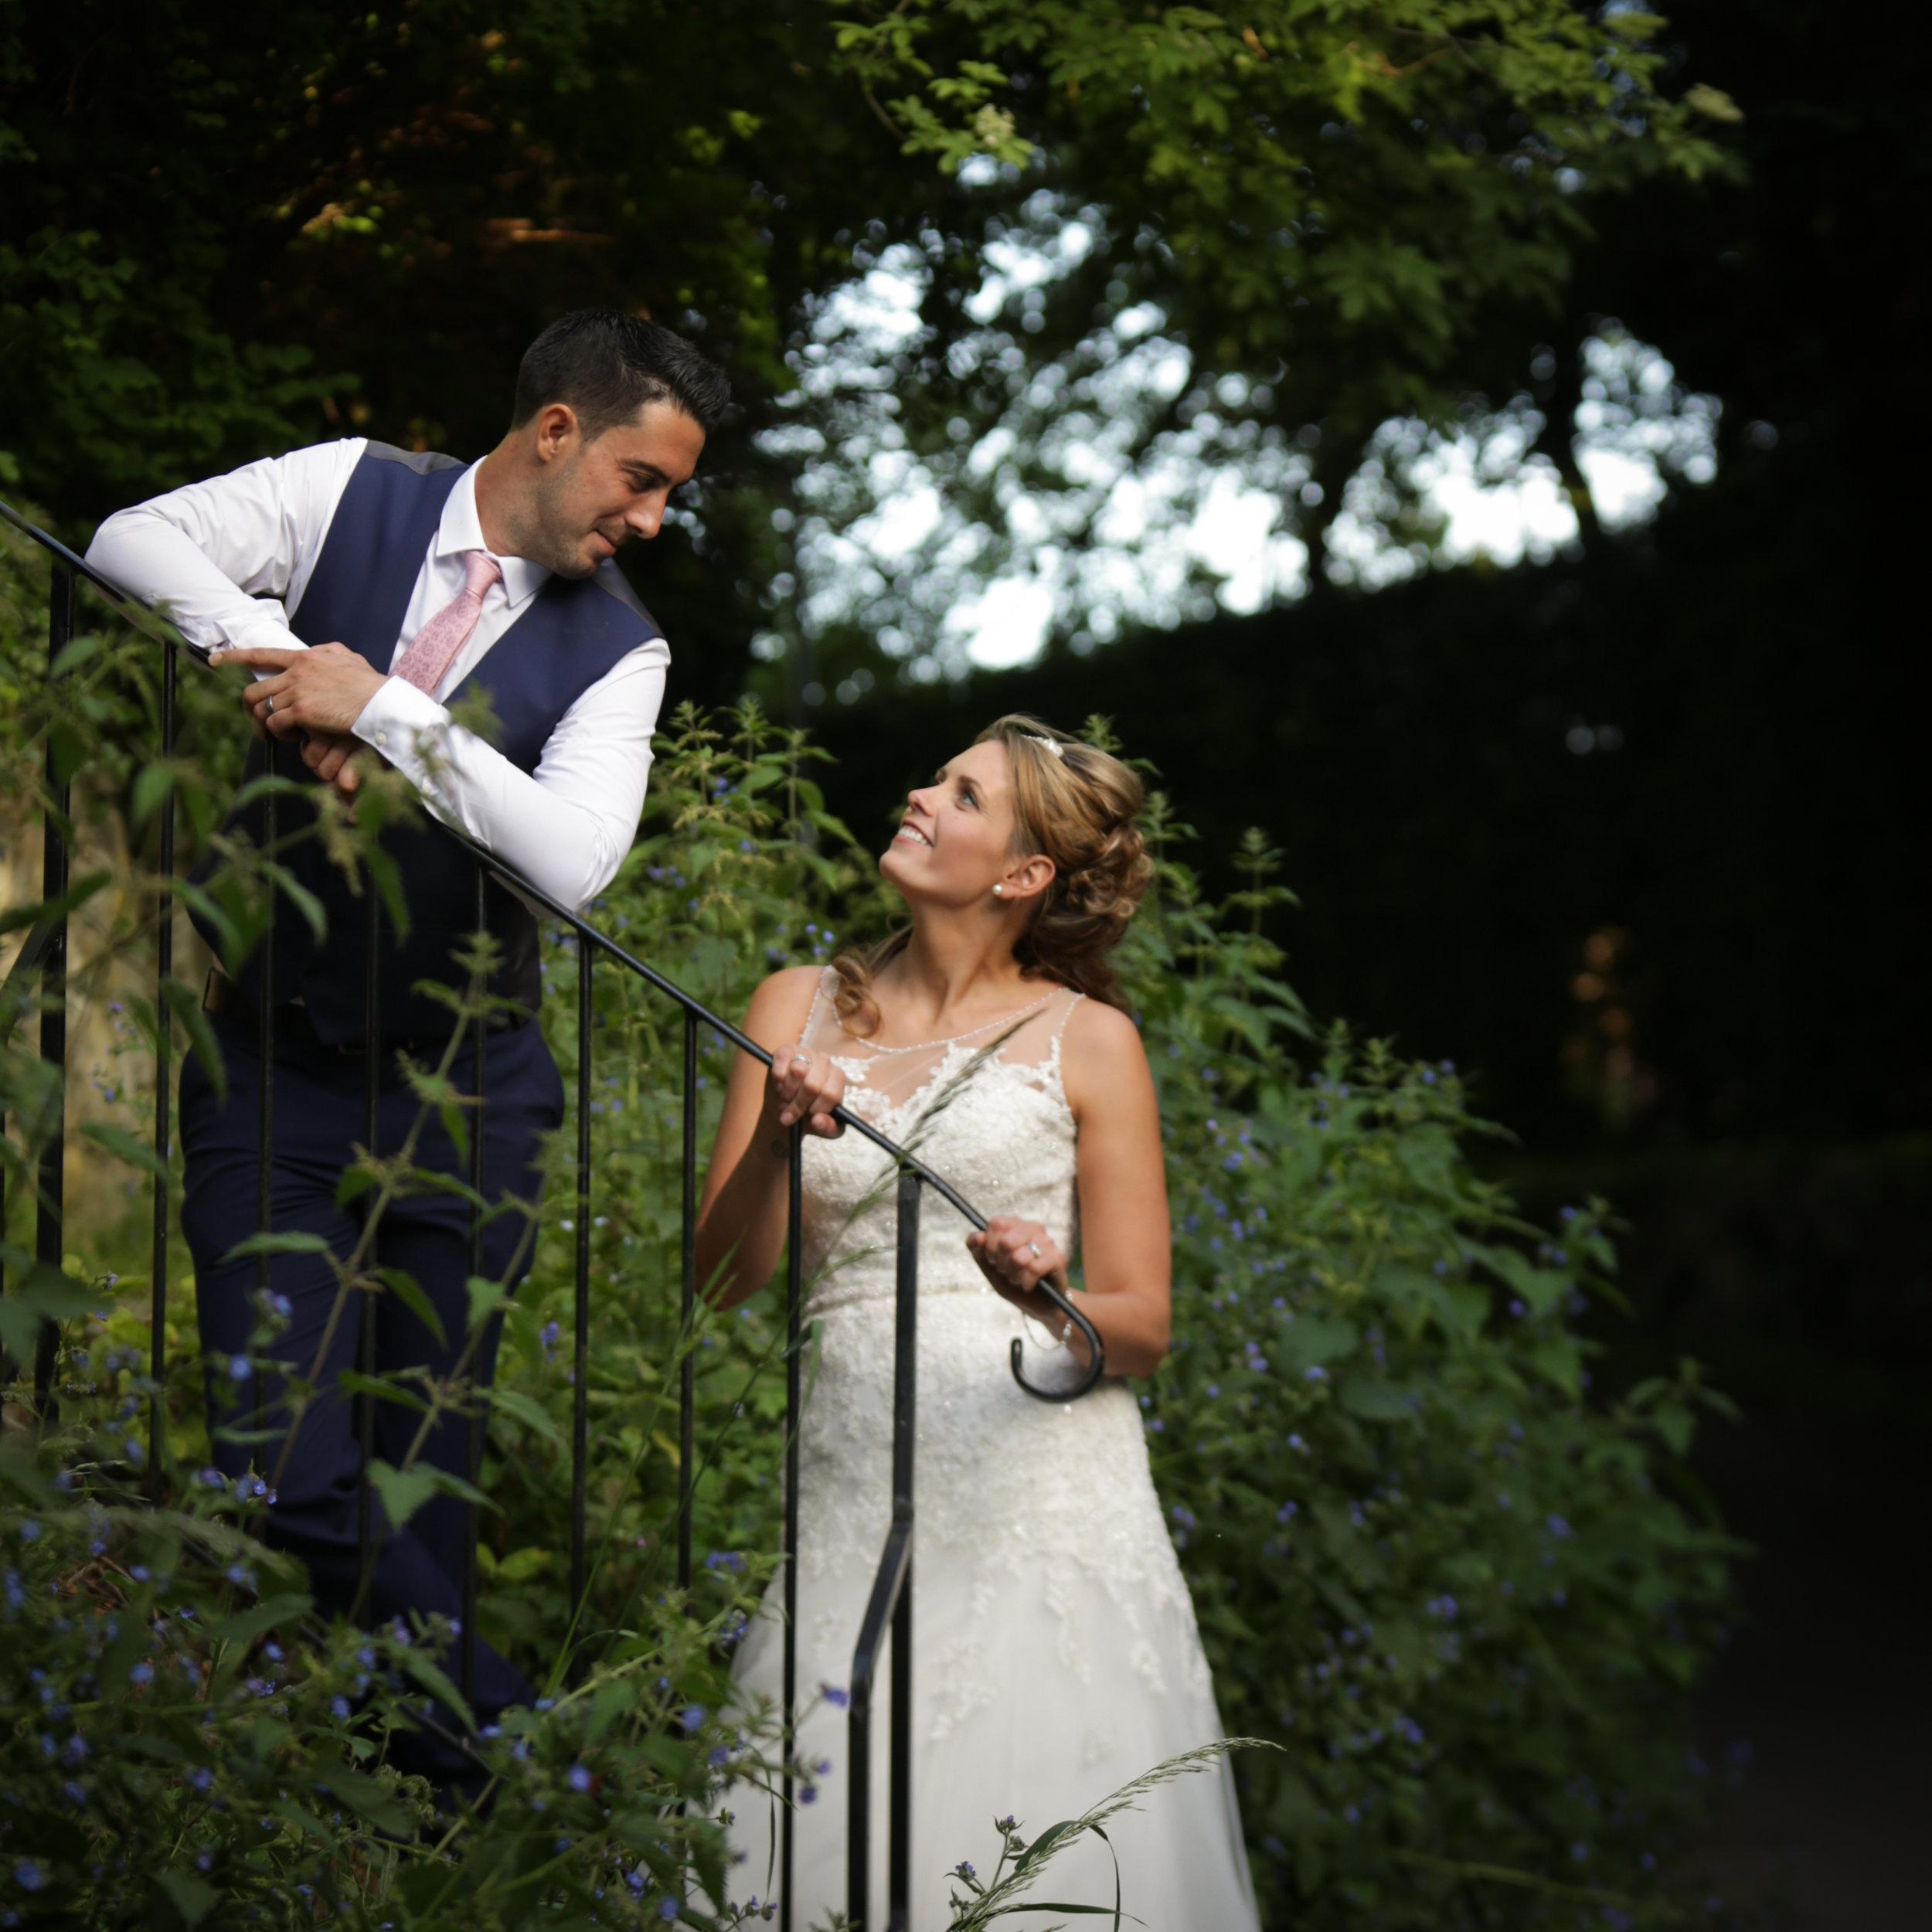 Archbishops Place Maidstone Wedding Photographer9.jpg